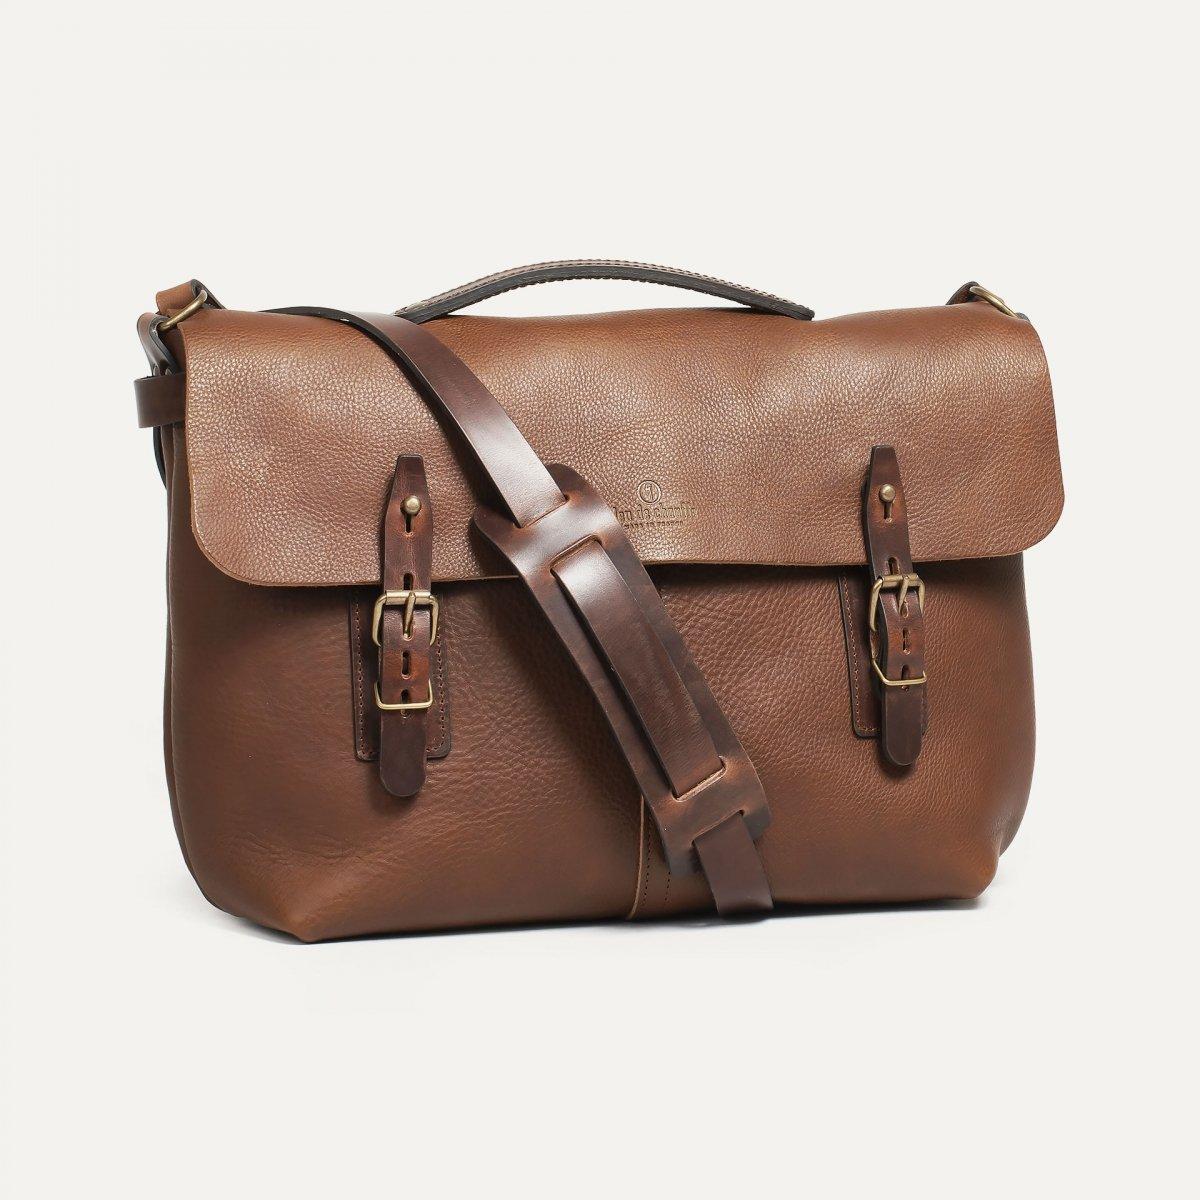 Lucien Satchel bag - Cuba Libre (image n°2)